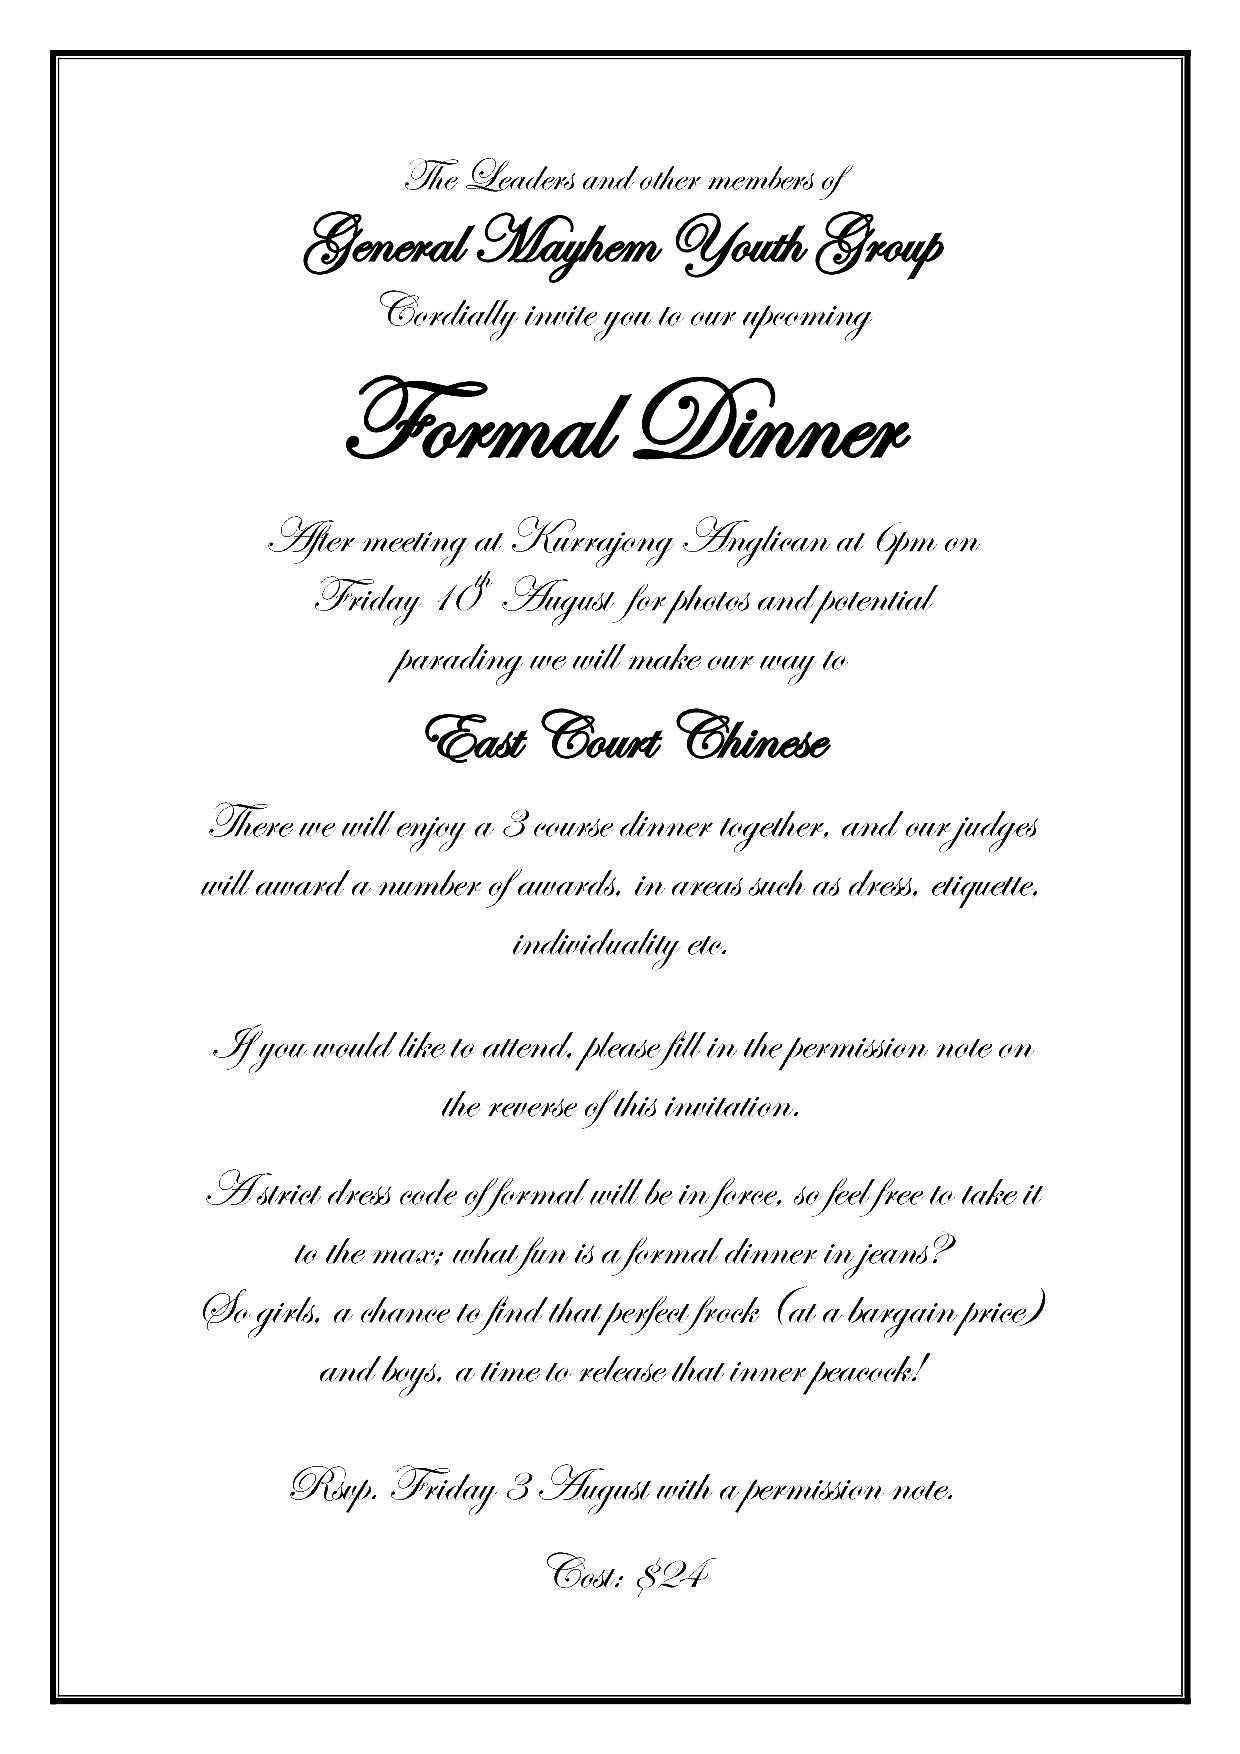 91 Visiting Dinner Invitation Example Ks2 Photo By Dinner Invitation Example Ks2 Cards Design Templates